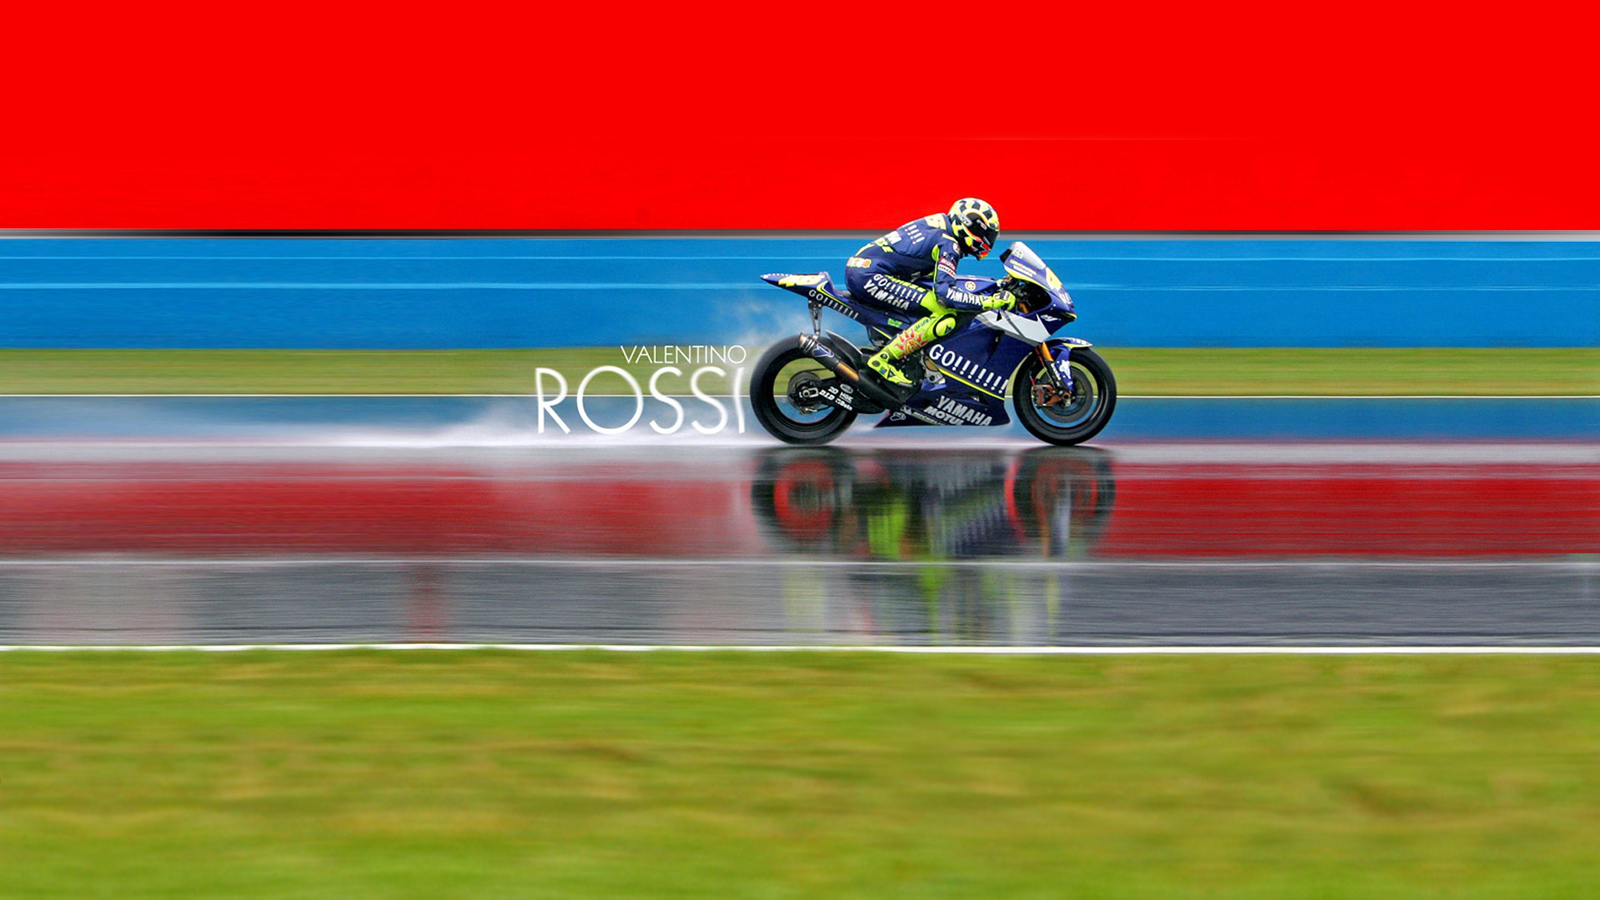 http://1.bp.blogspot.com/-biV4tyy7-hs/UO82pN6I3gI/AAAAAAAAJwI/CA13RStw_G4/s1600/Valentino_Rossi_Italian_MotoGP_Champion_Racer_2013_Hd_Desktop_Wallpaper_citiesandteams.blogspot.com.jpg